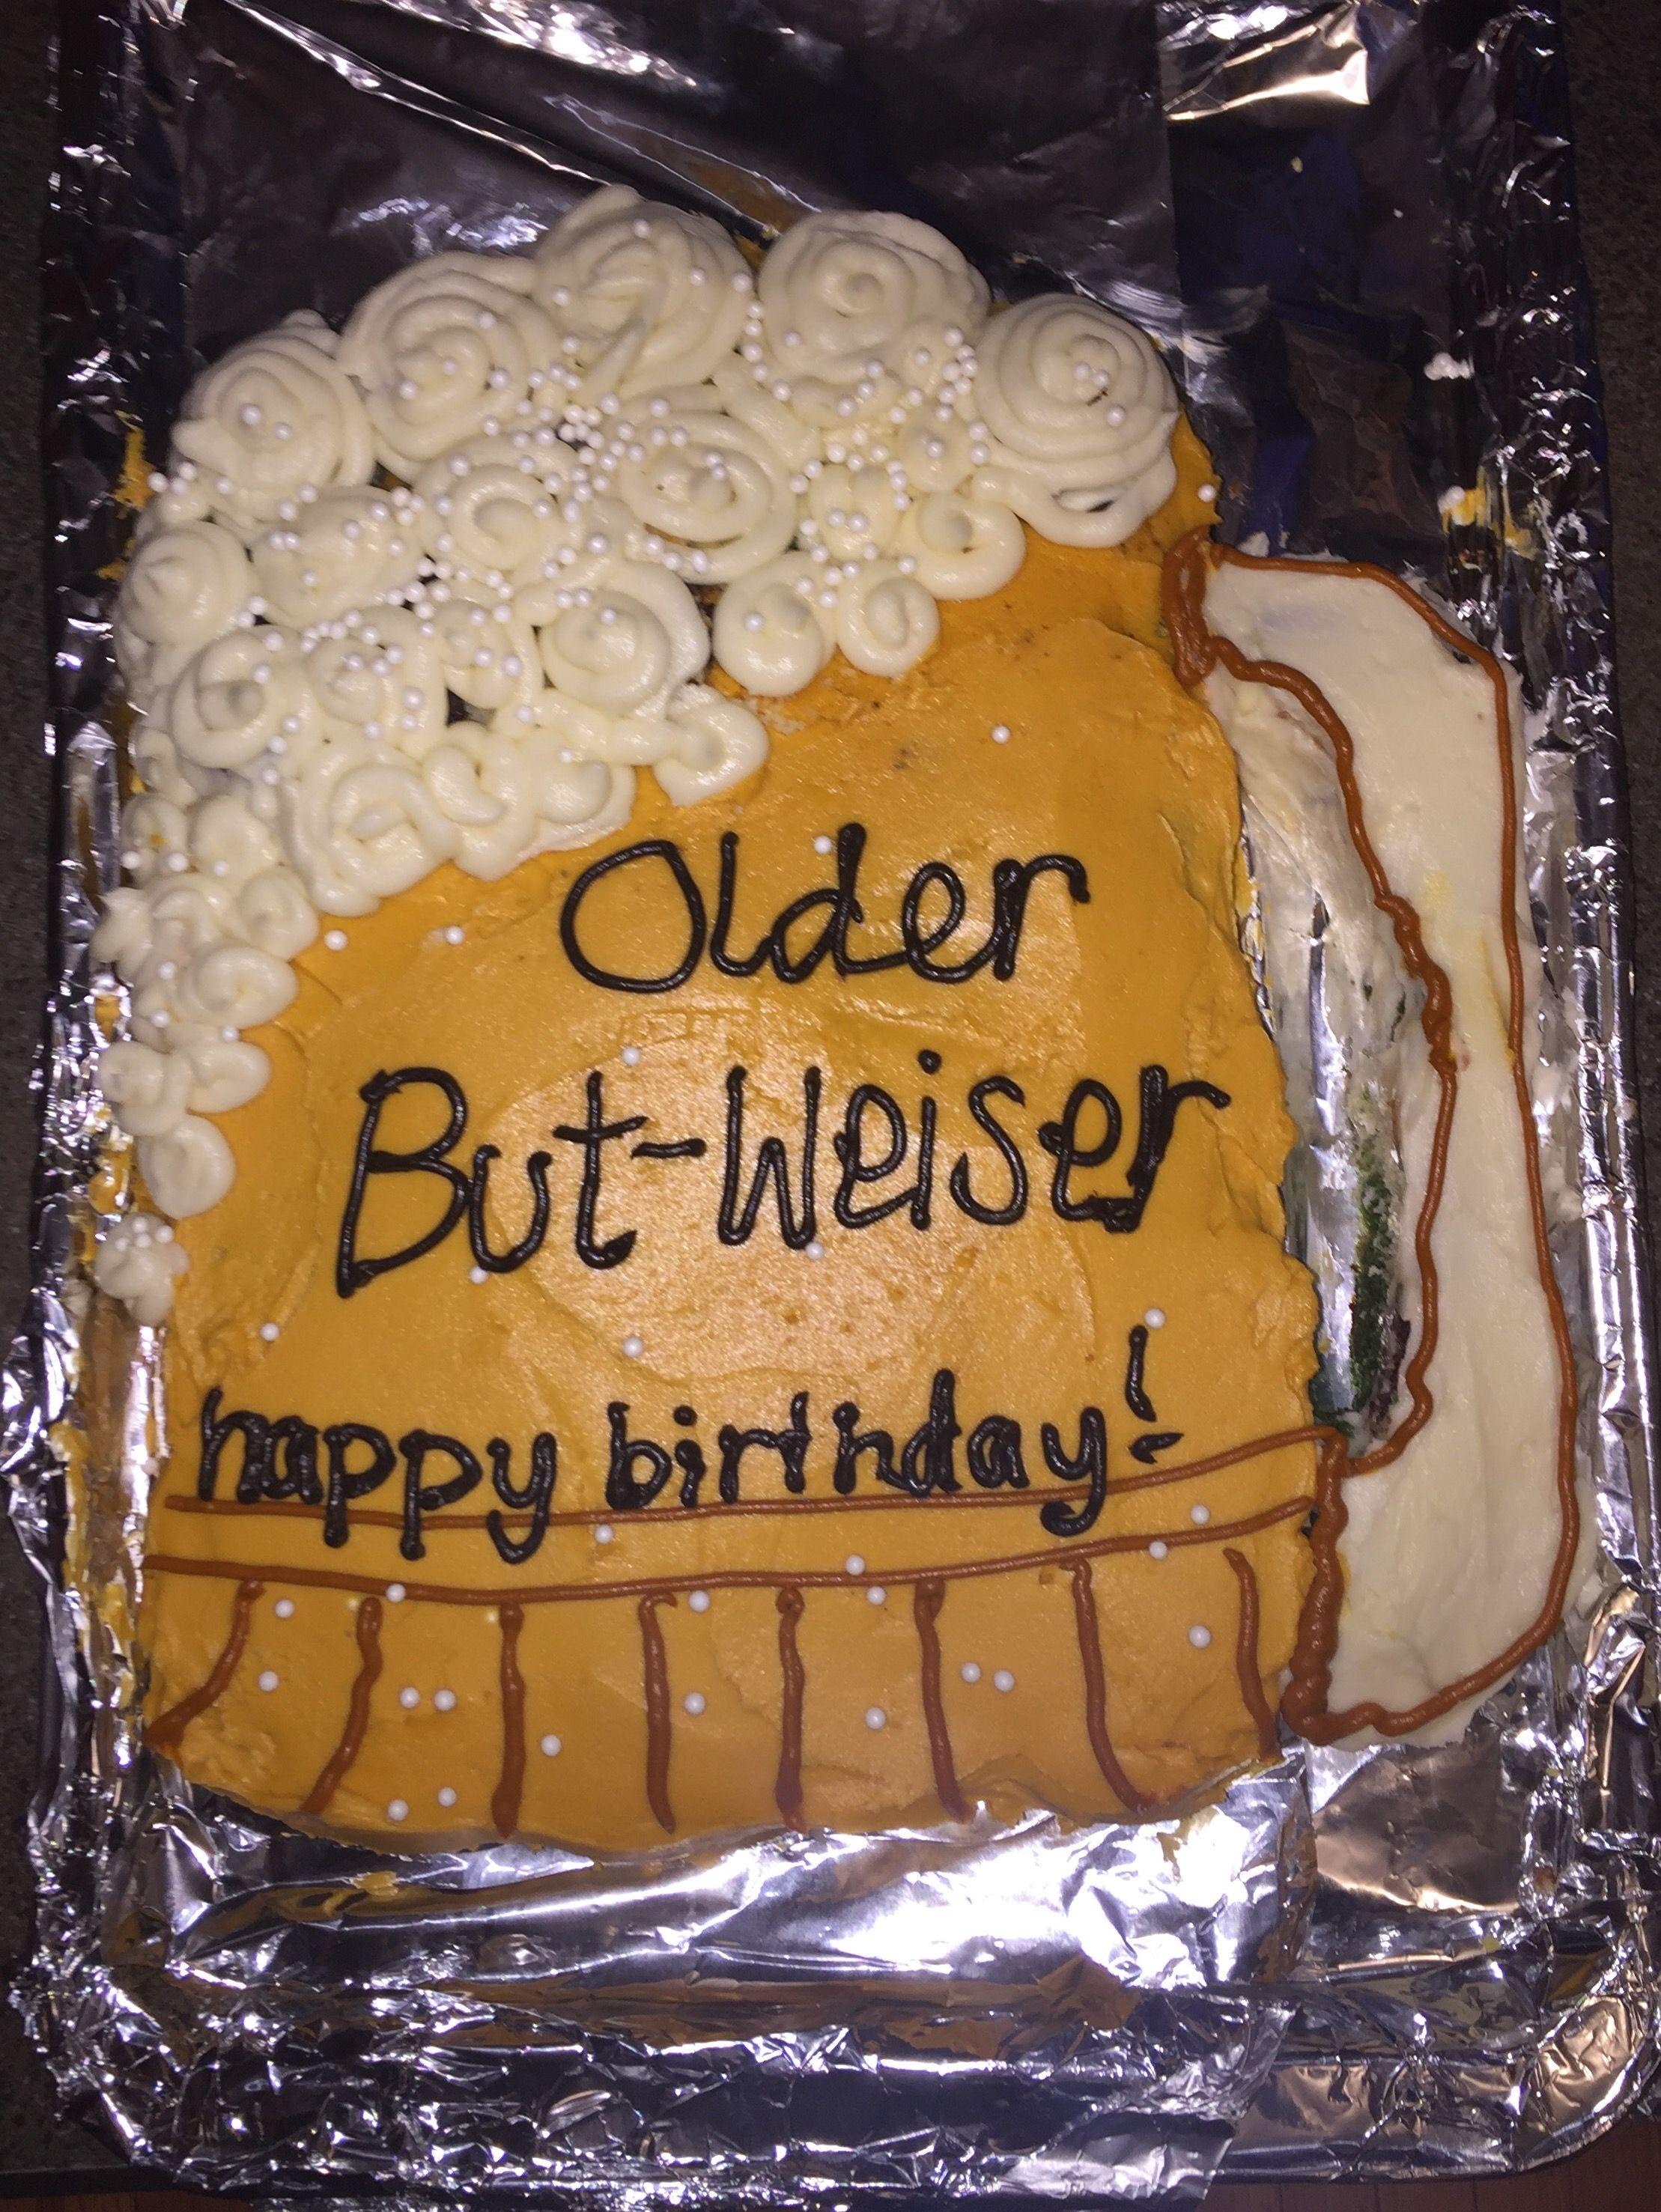 Beer Birthday Cake! #beer #birthdaycake #birthday #happybirthday